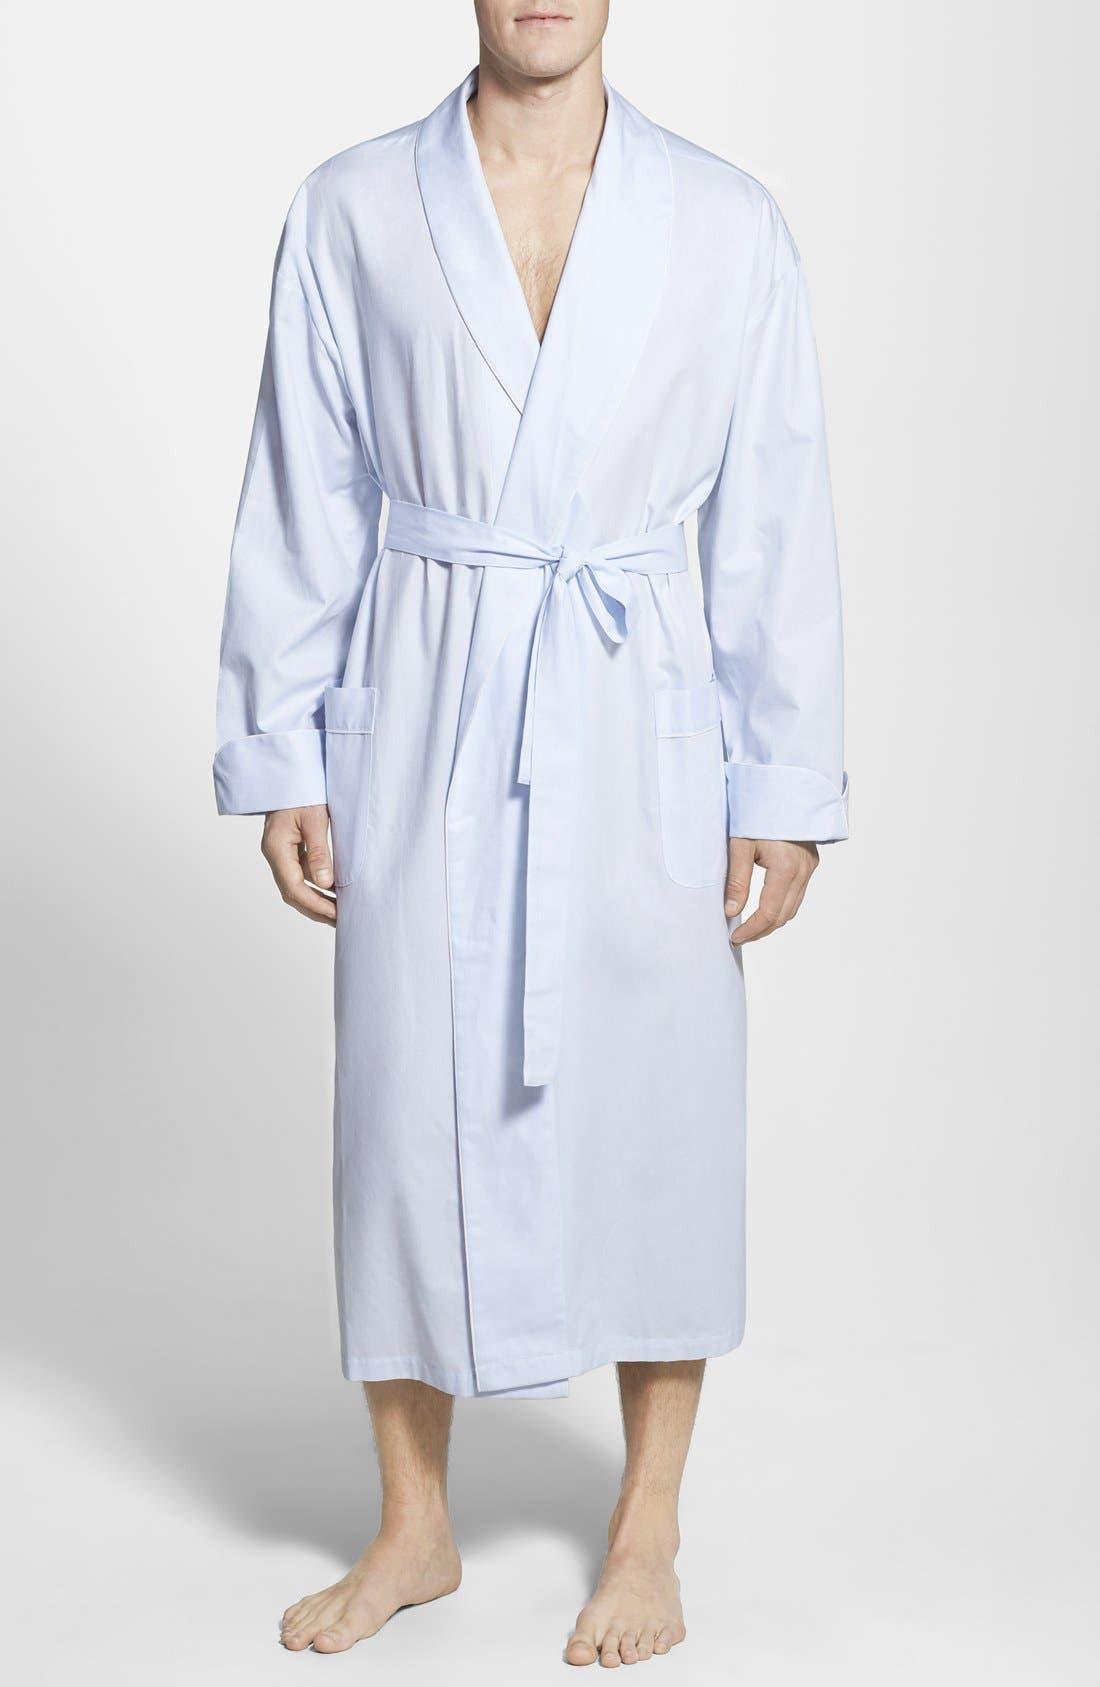 MAJESTIC INTERNATIONAL 'Signature' Cotton Robe